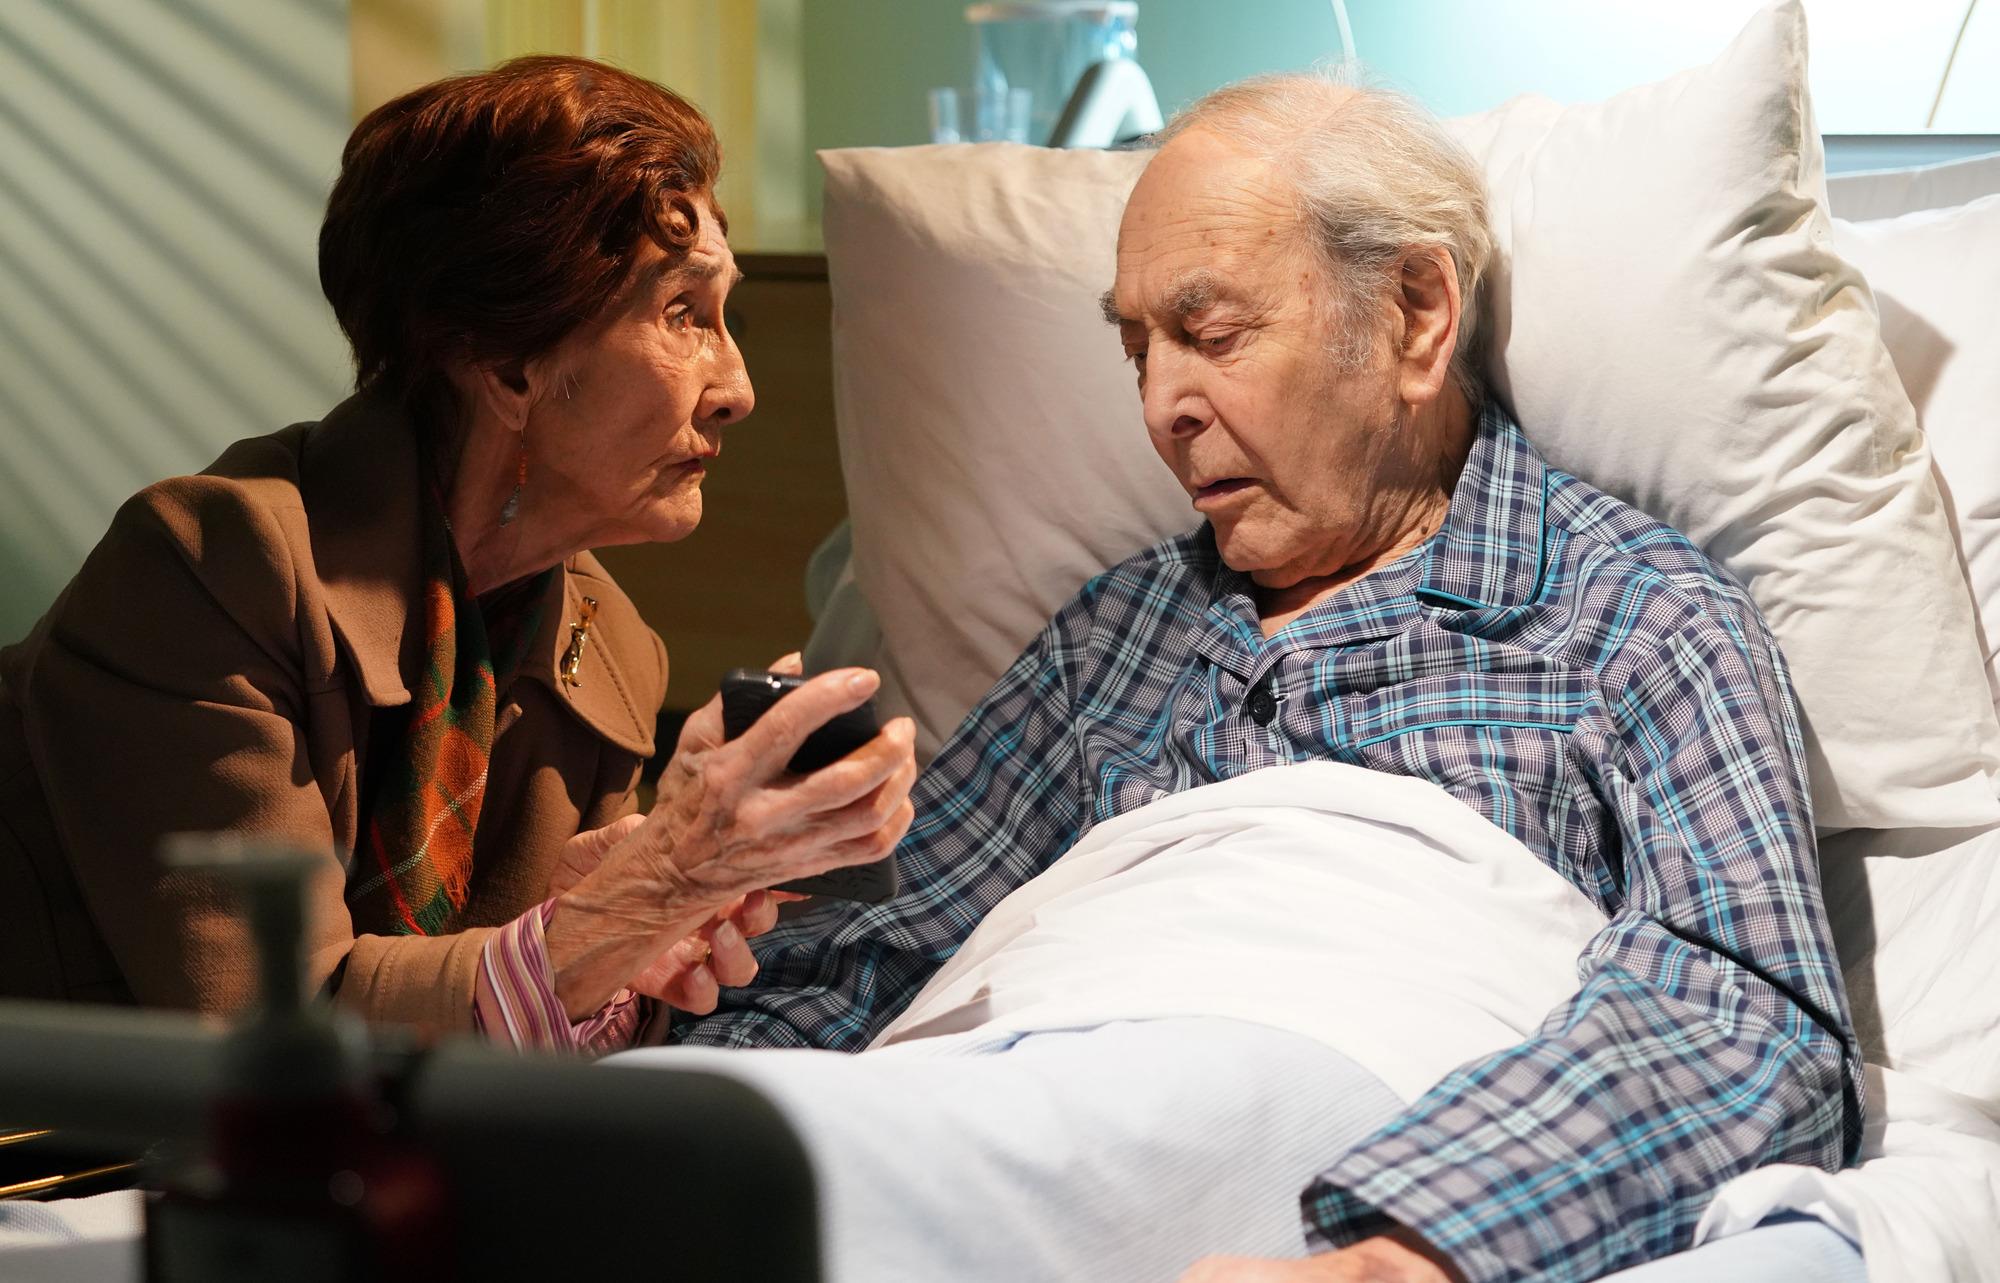 EastEnders spoilers: Dr Legg's devastating death scenes revealed in emotional episode